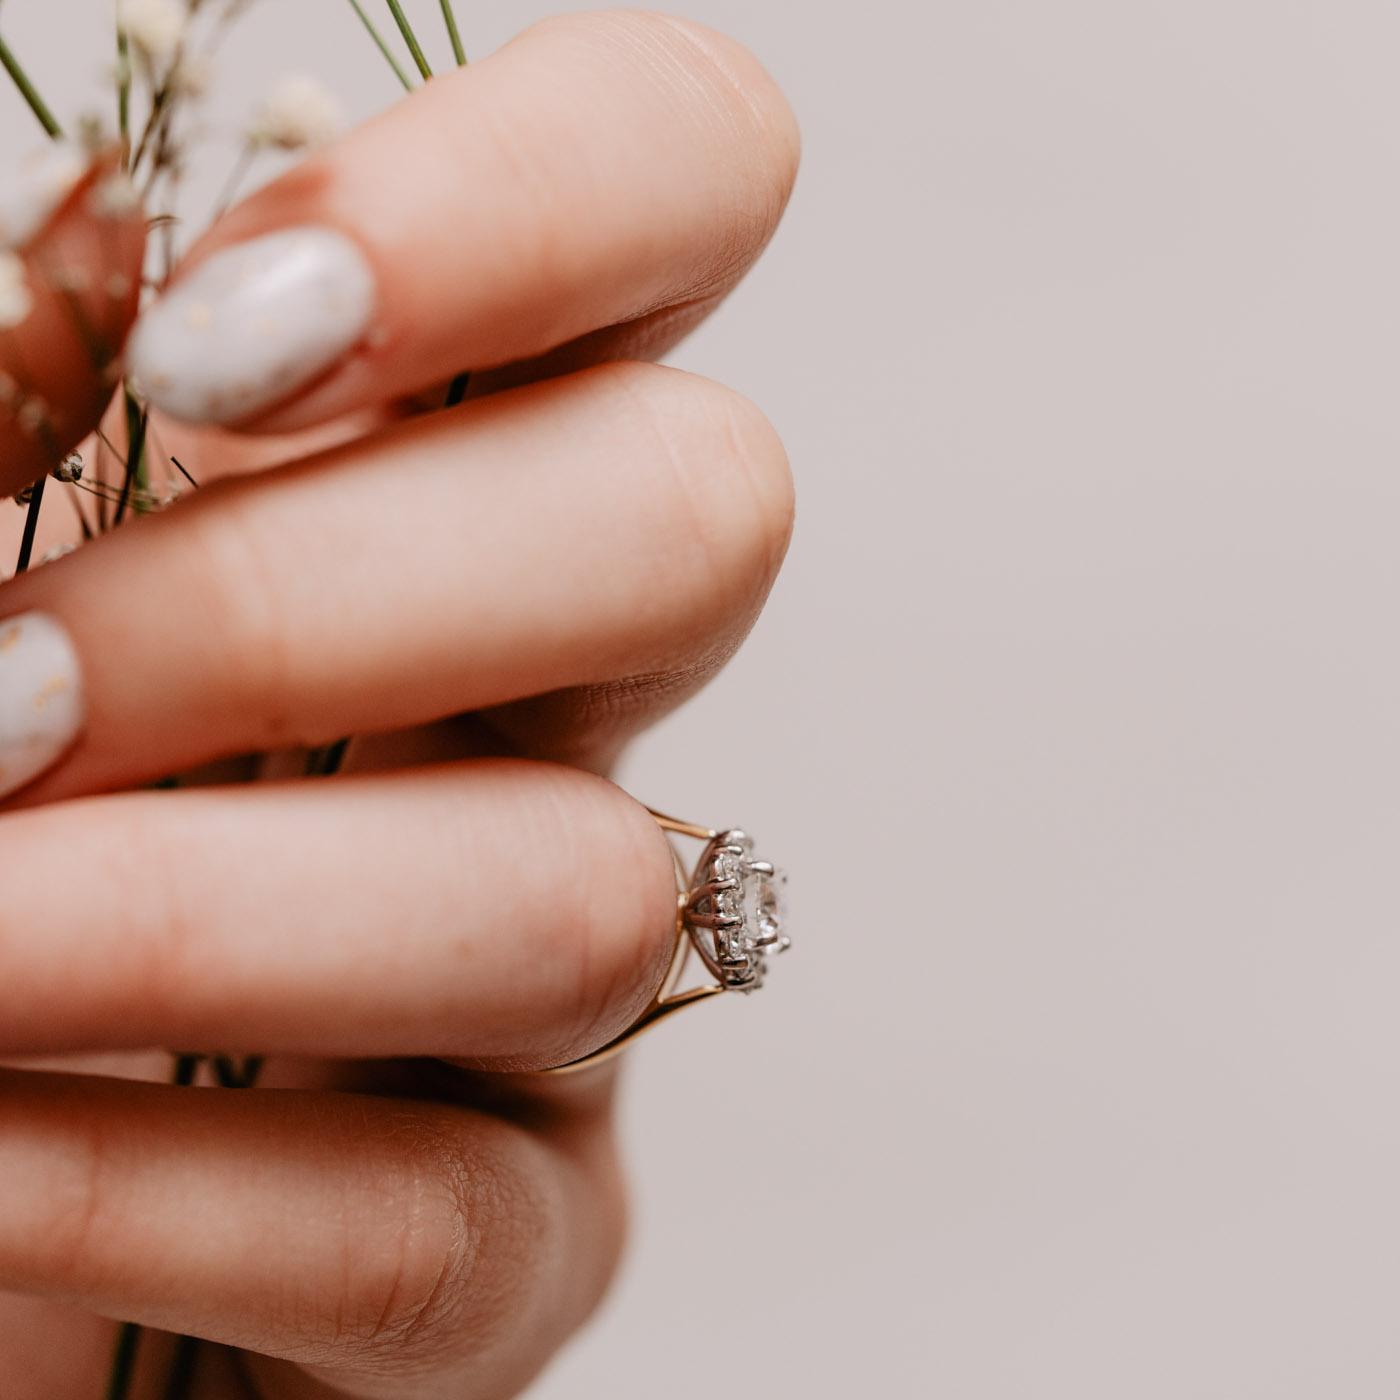 Earth Friendly Diamond Alternative Ring | Dahlia | Ethica Diamonds UK